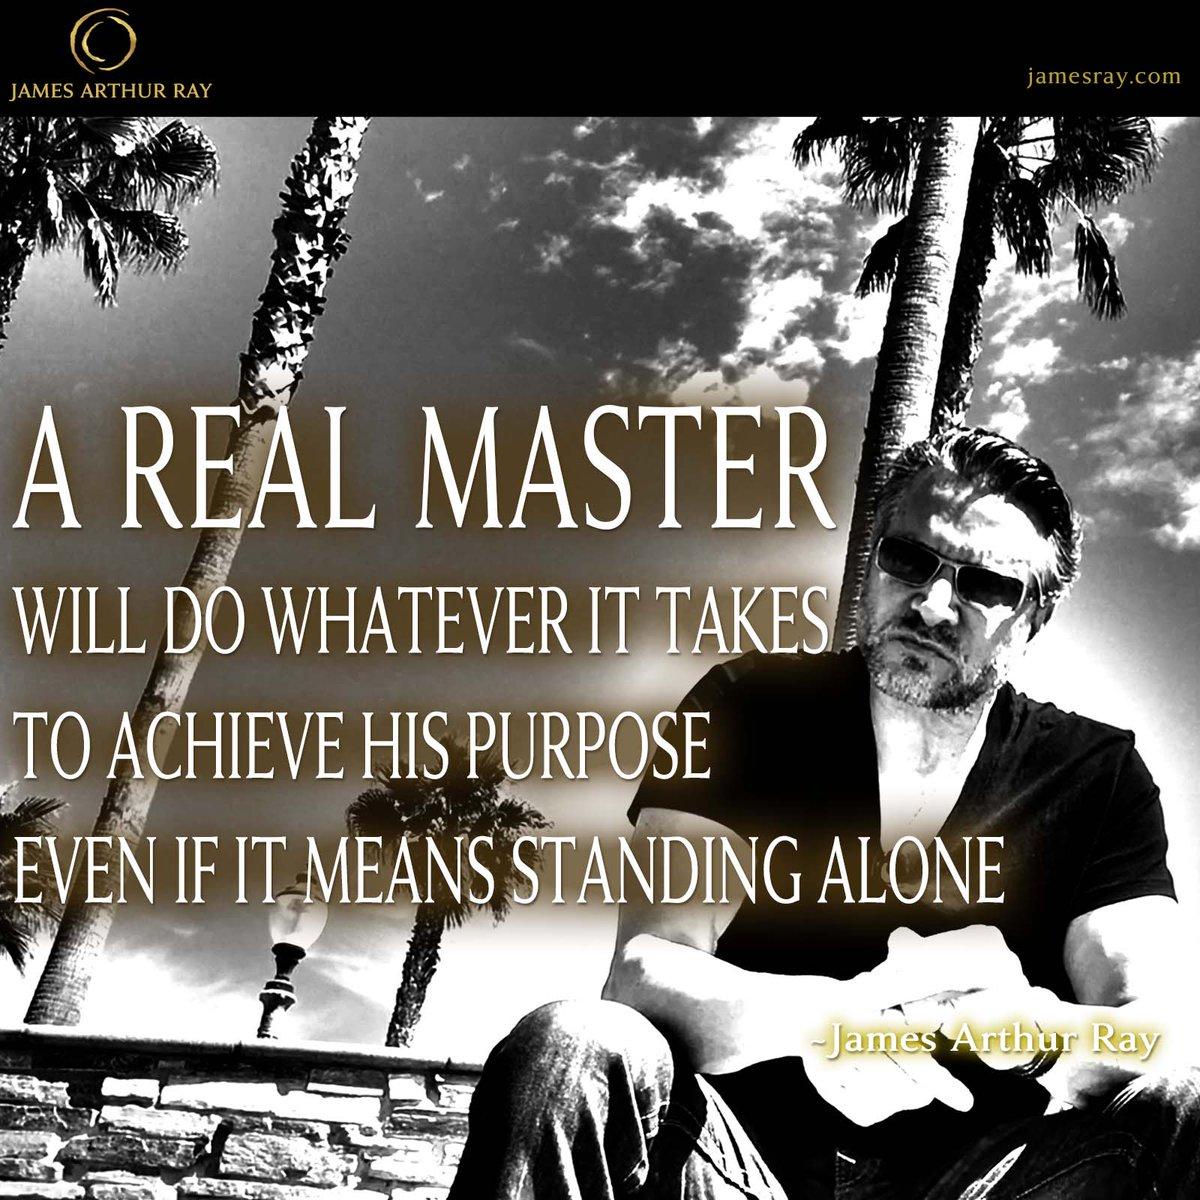 #Coaching #Resilience #JamesArthurRay #Success #LIVEBIG #Motivation https://t.co/XKiMwN1qaf https://t.co/lqsxMaLhp6